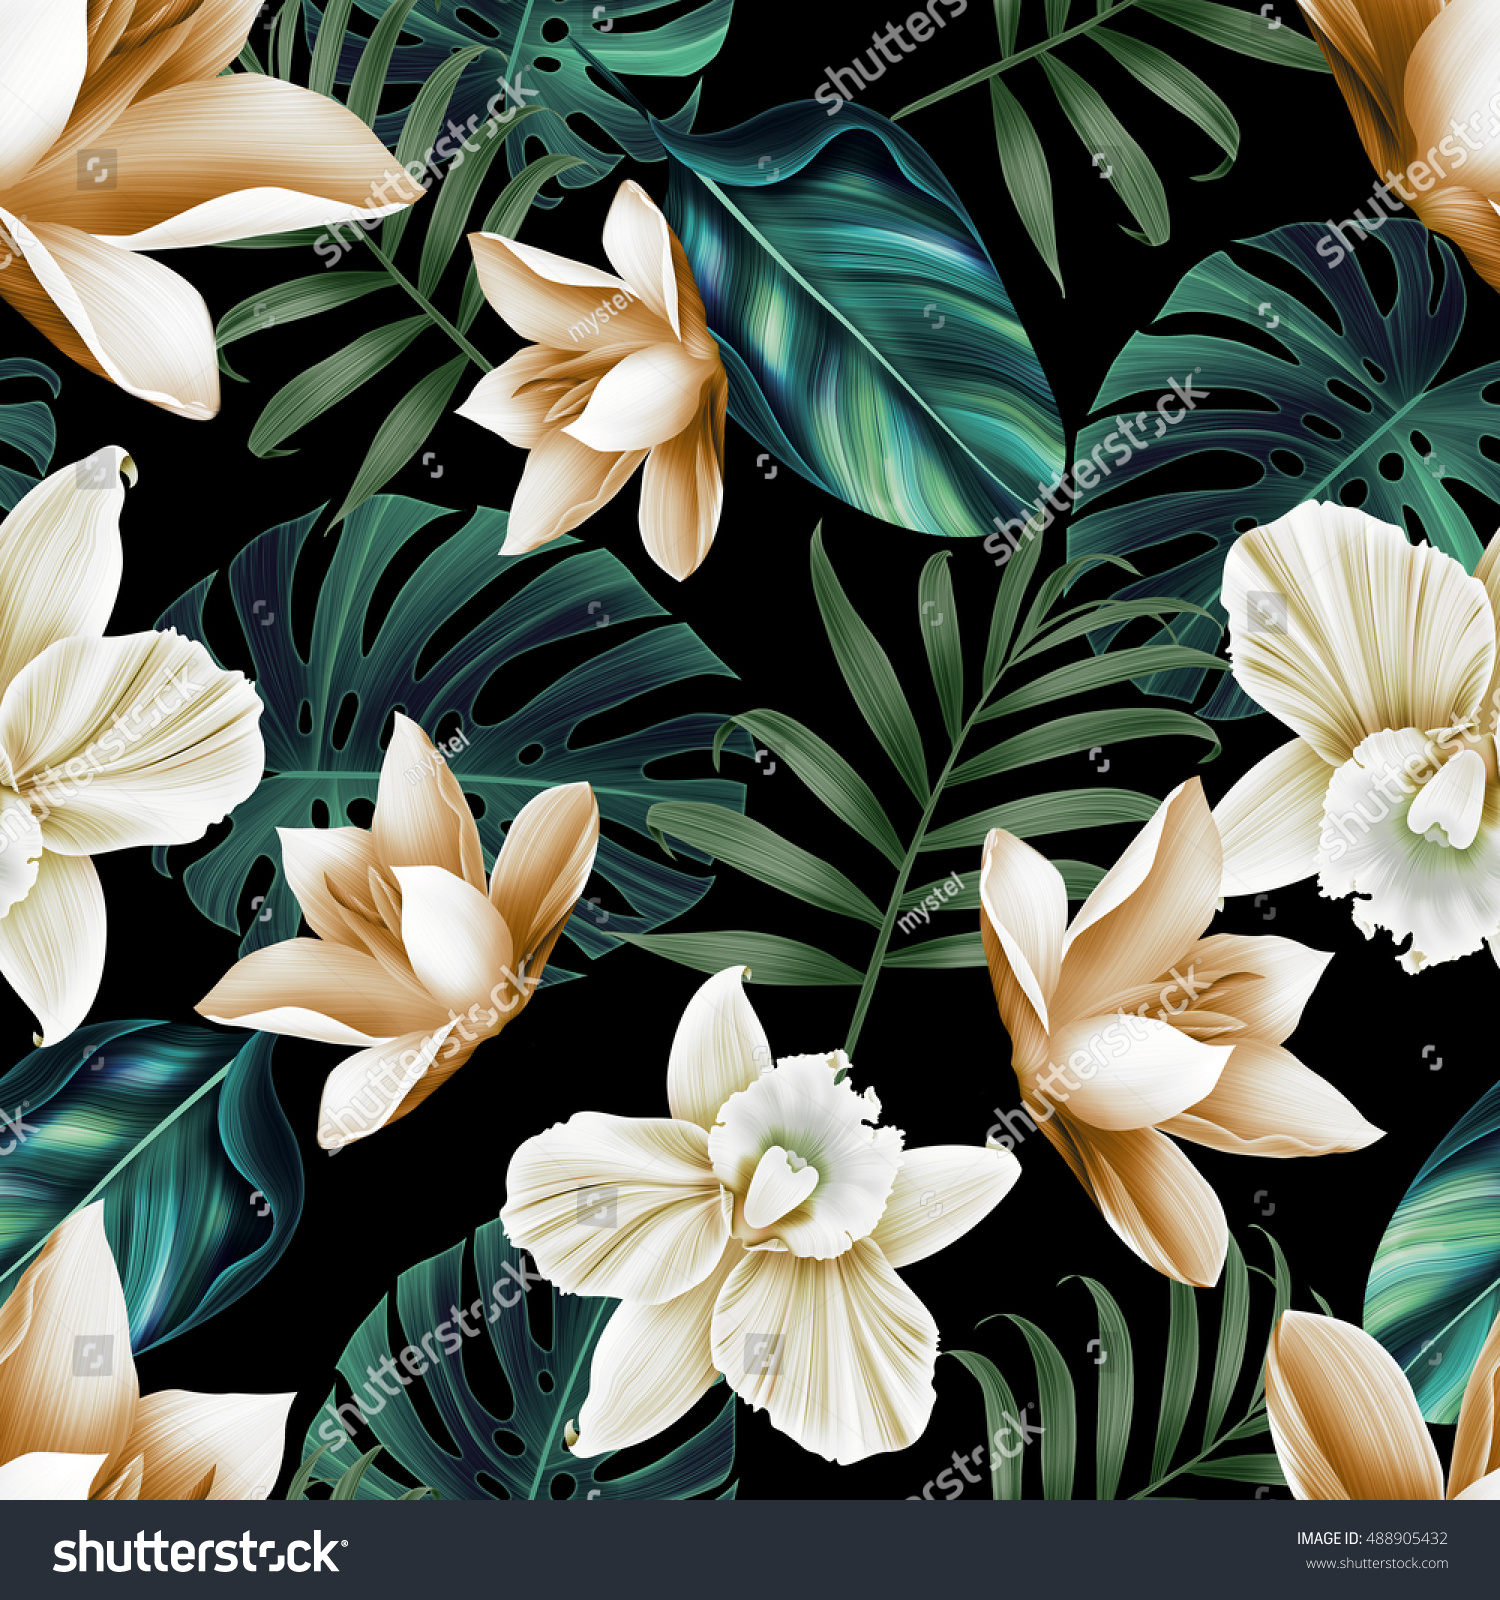 Seamless tropical flower plant pattern background hawaiian seamless tropical flower plant pattern background hawaiian californian florida summer style ez canvas izmirmasajfo